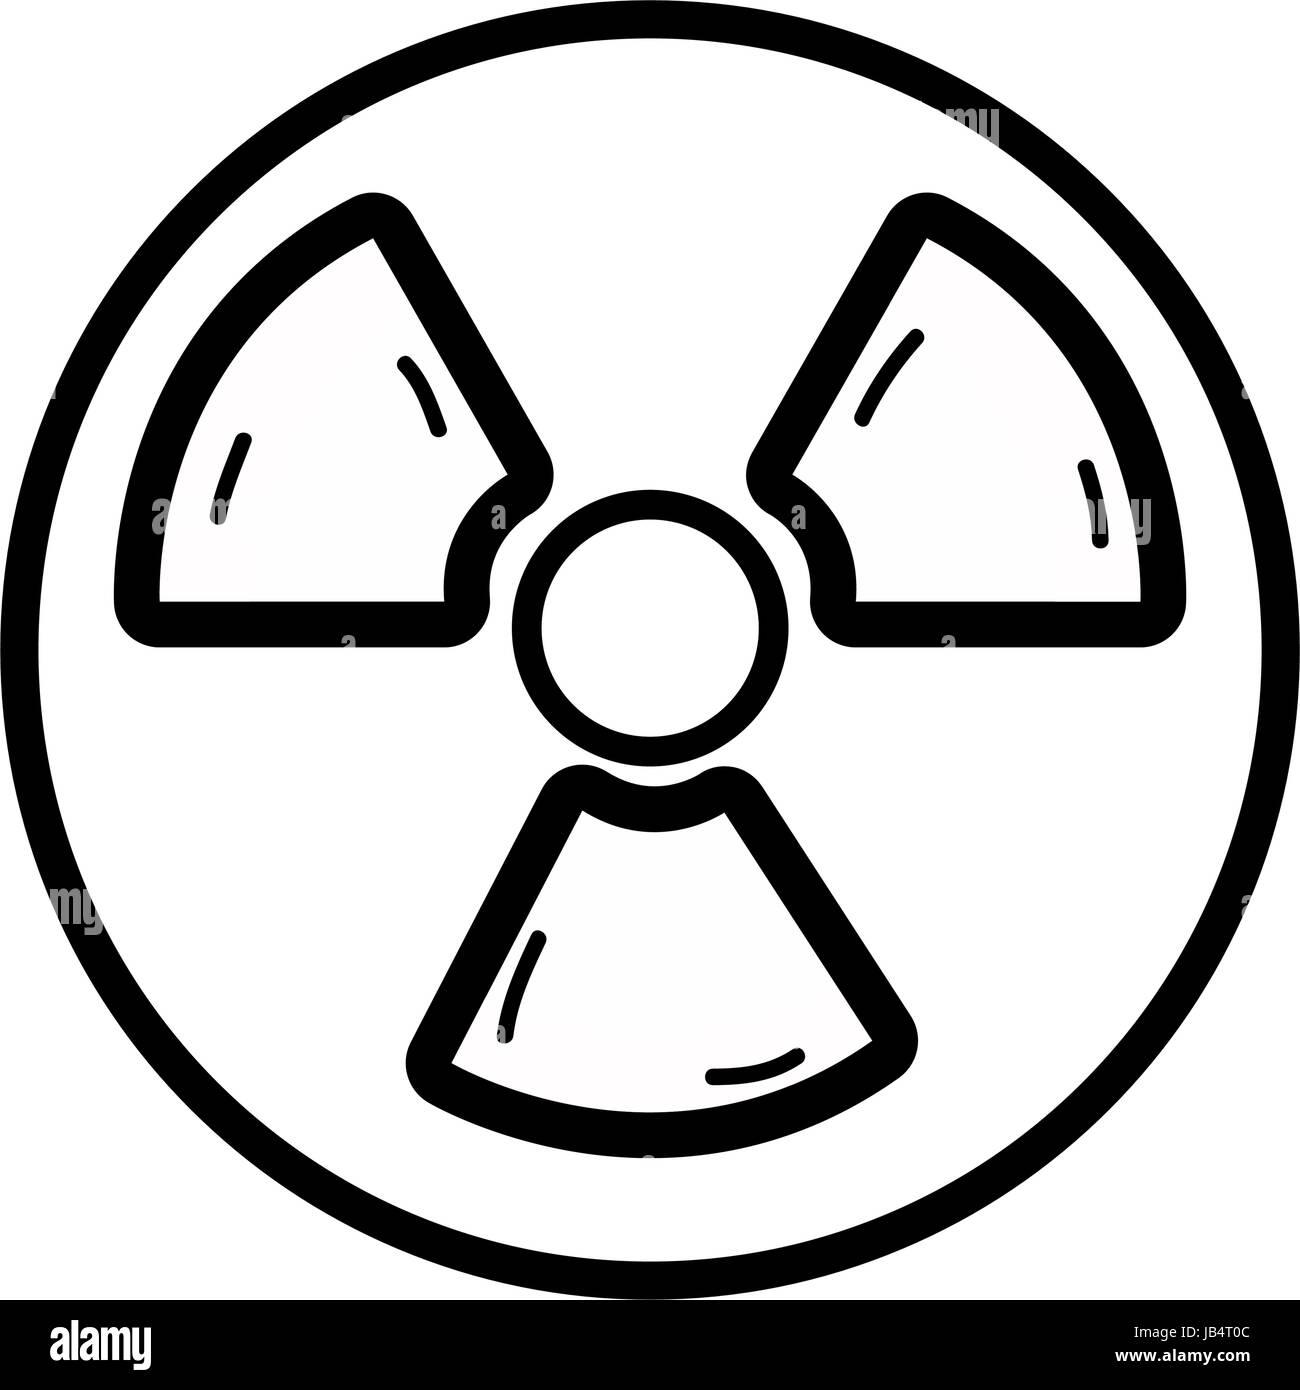 line radiation symbol to dangerous and ecology contamination - Stock Image